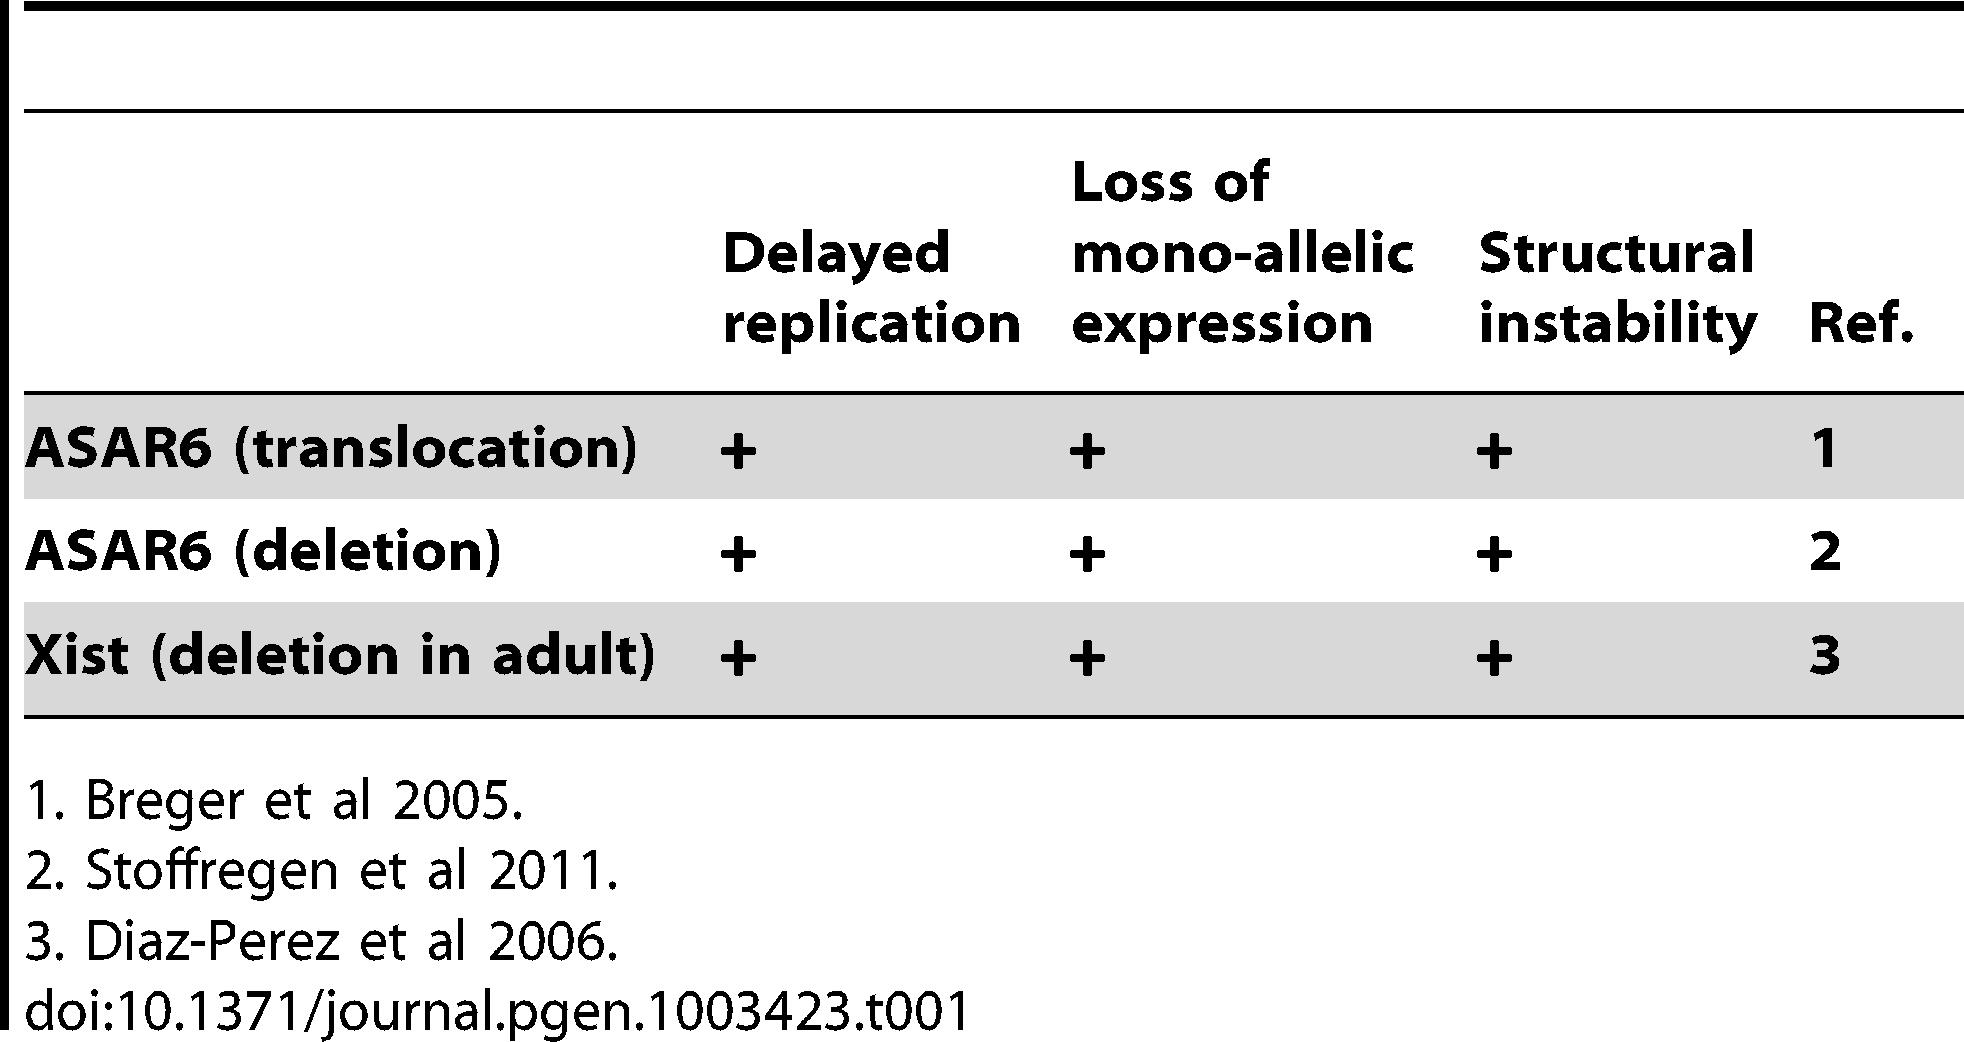 Phenotypes associated with gene disruption.